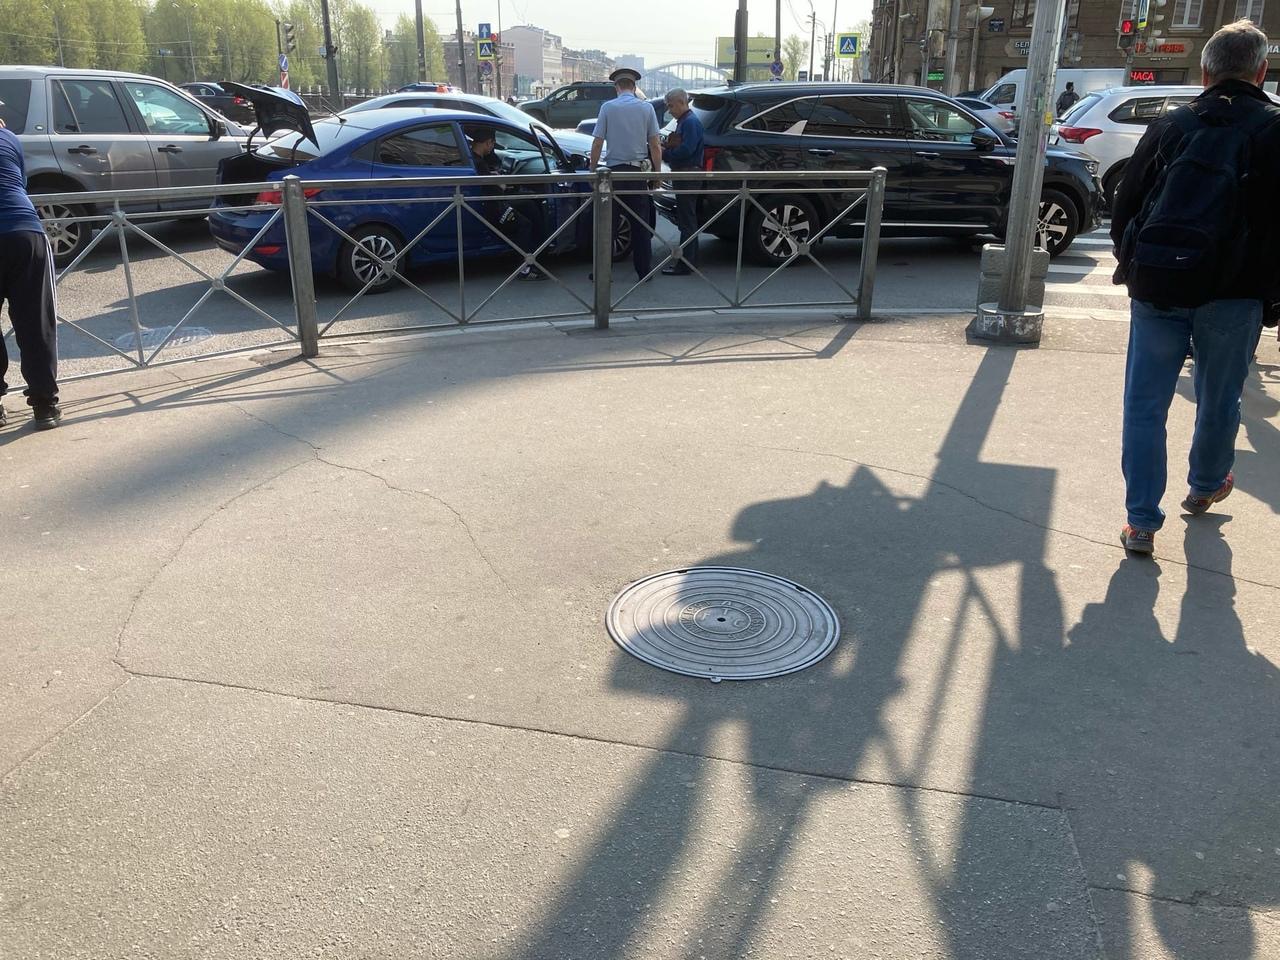 В летнее жаркое утро товарищ инспектор оформляет ДТП на повороте с Обводного канала на Лиговский про...